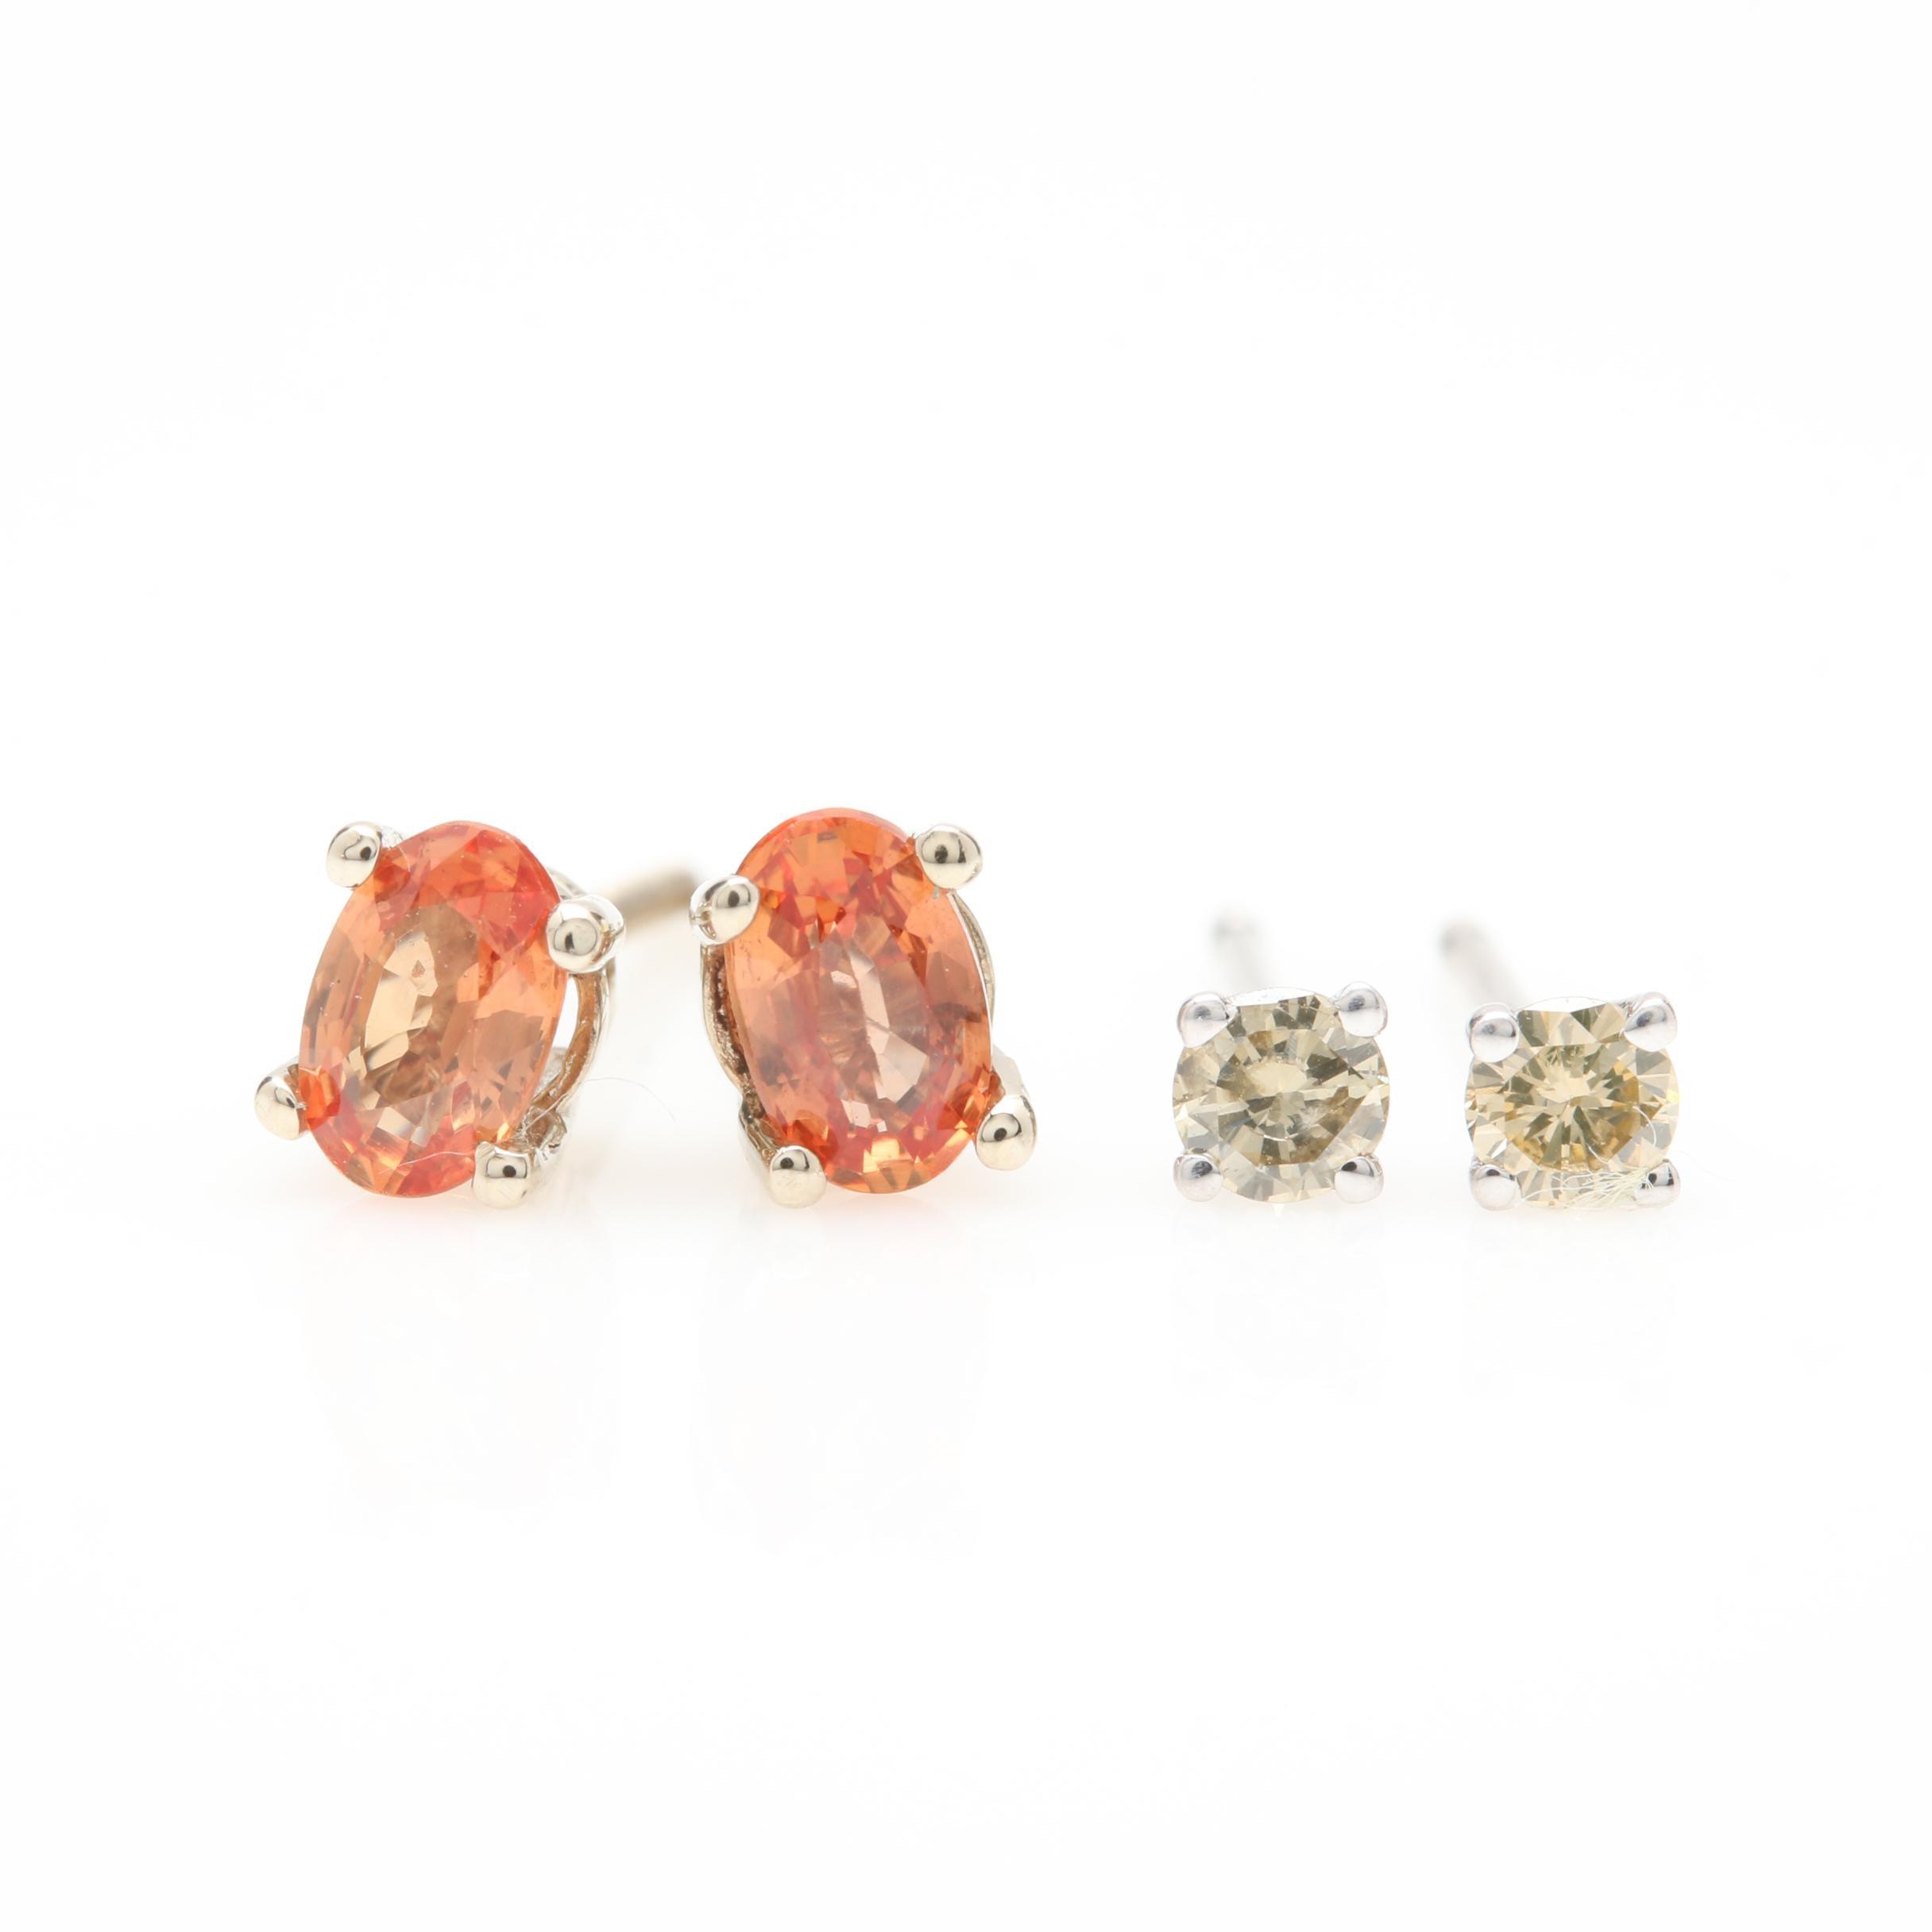 14K White Gold Diamond and Orange Sapphire Stud Earrings